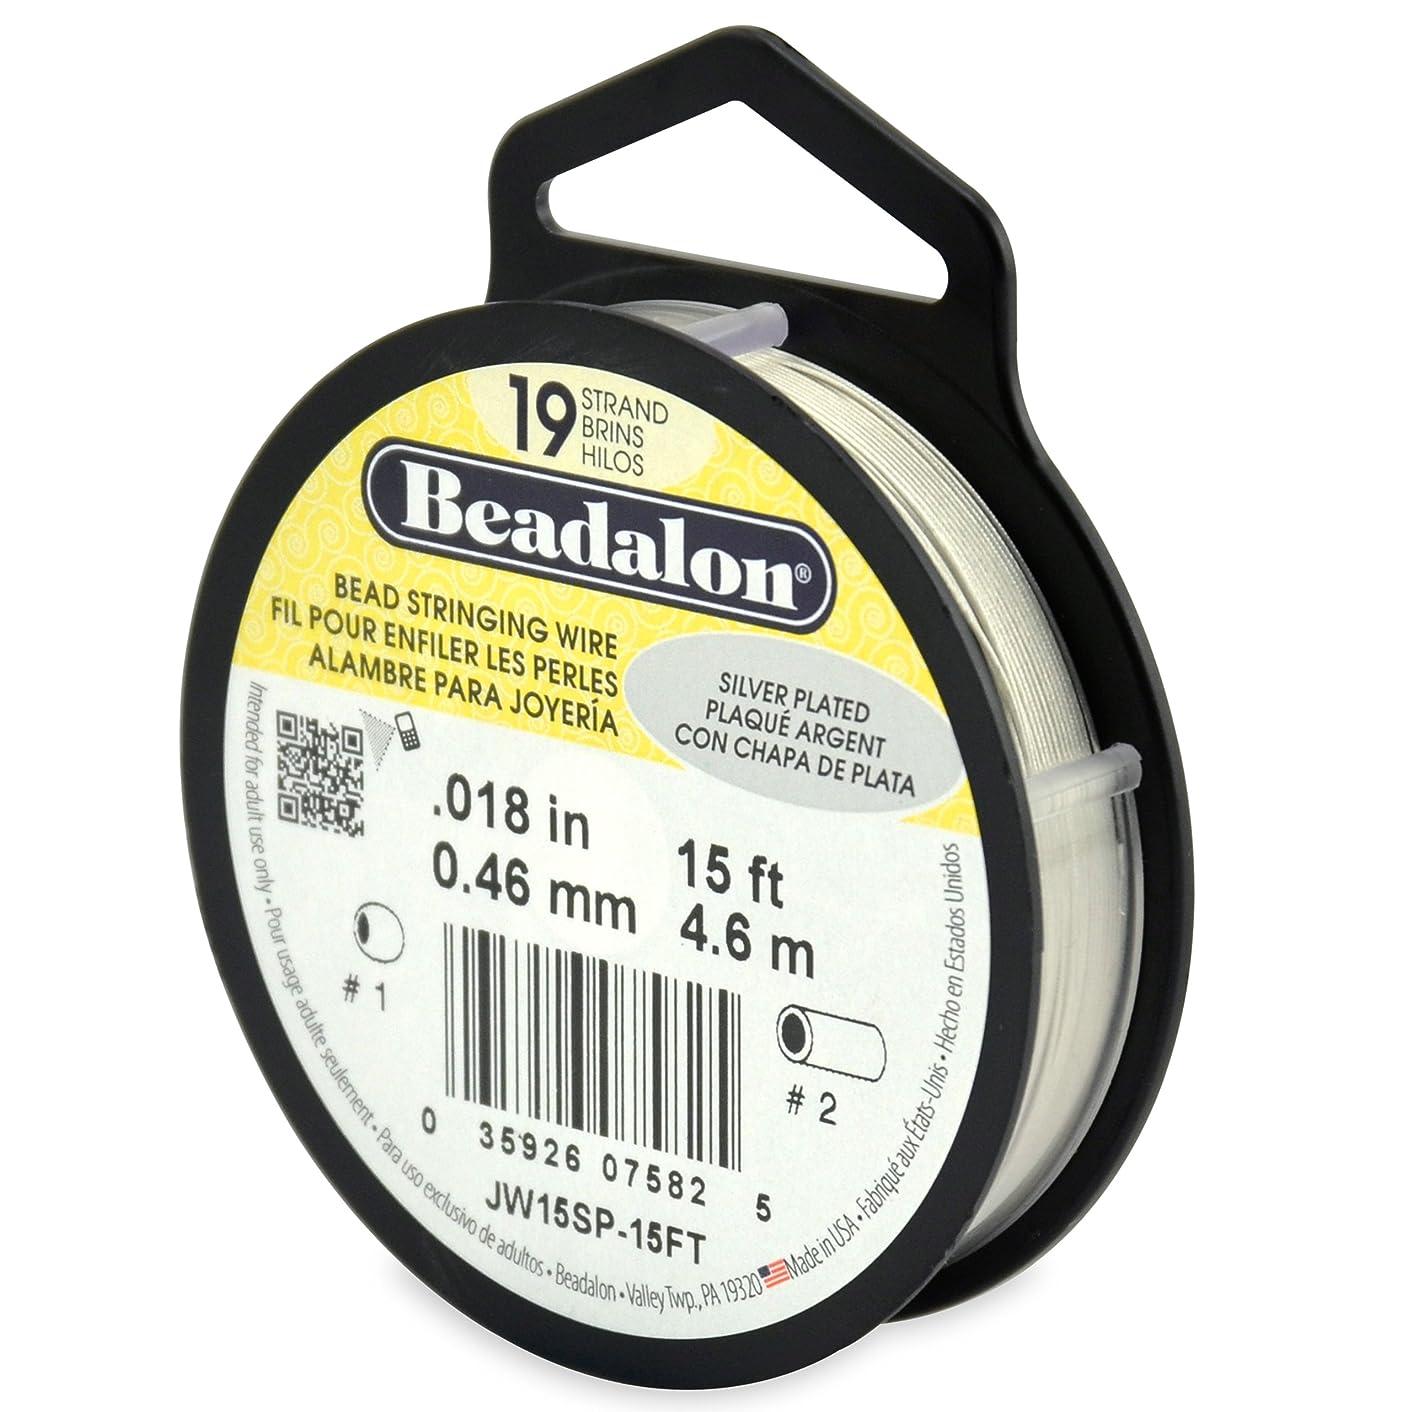 Beadalon 19-Strand Bead Stringing Wire, 0.018-Inch, Silver Plated, 15-Feet